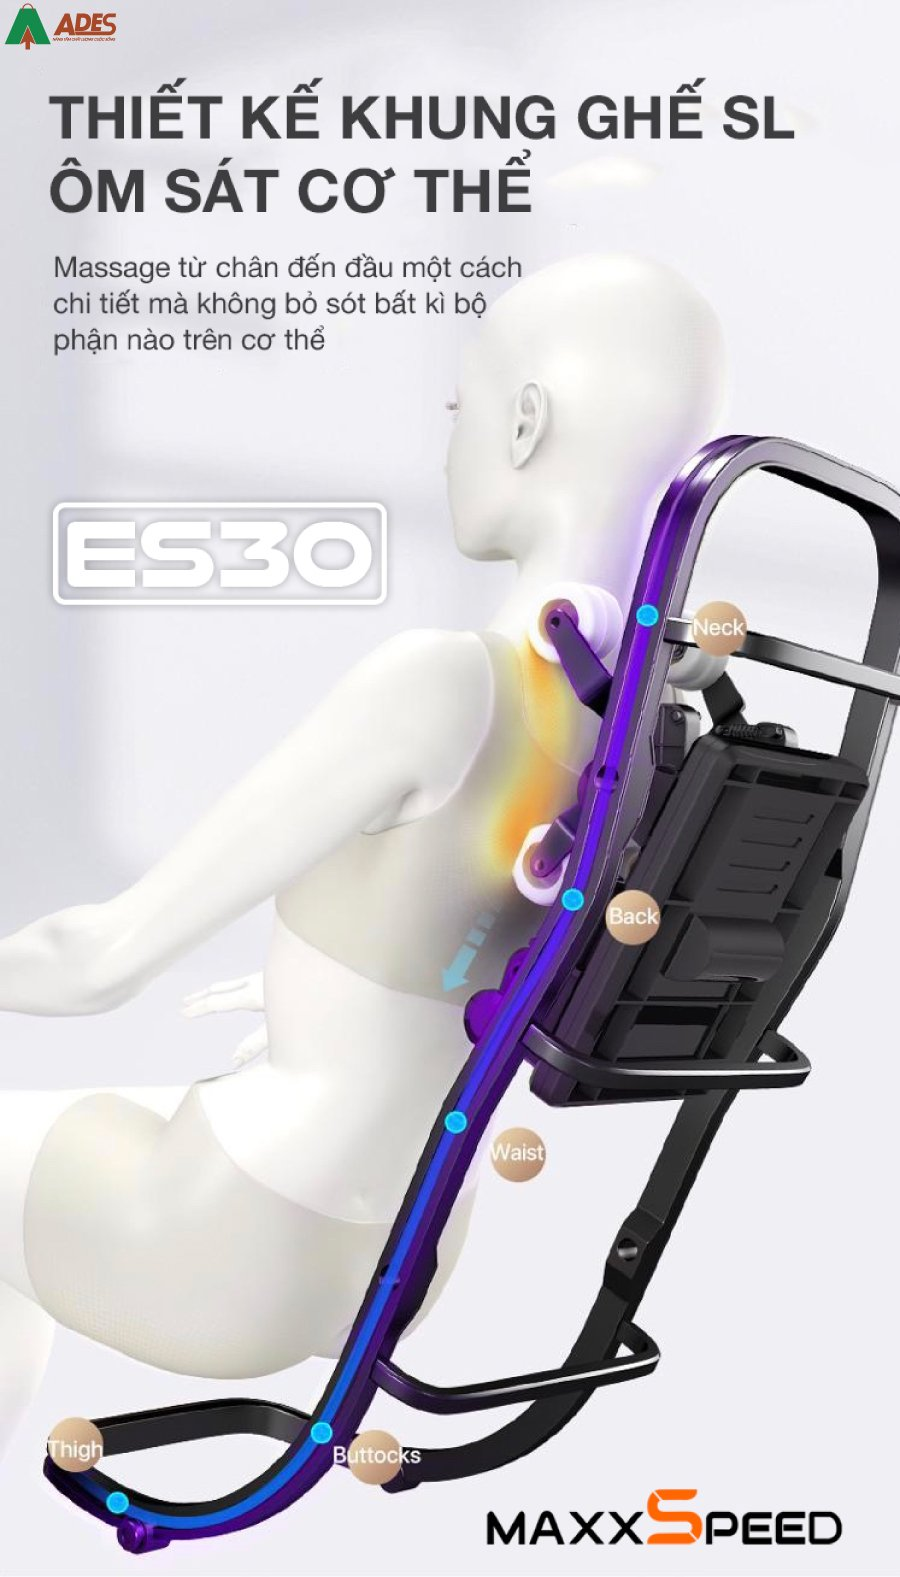 Ghe Massage Azaki Maxxspeed ES30 gia khuyen mai